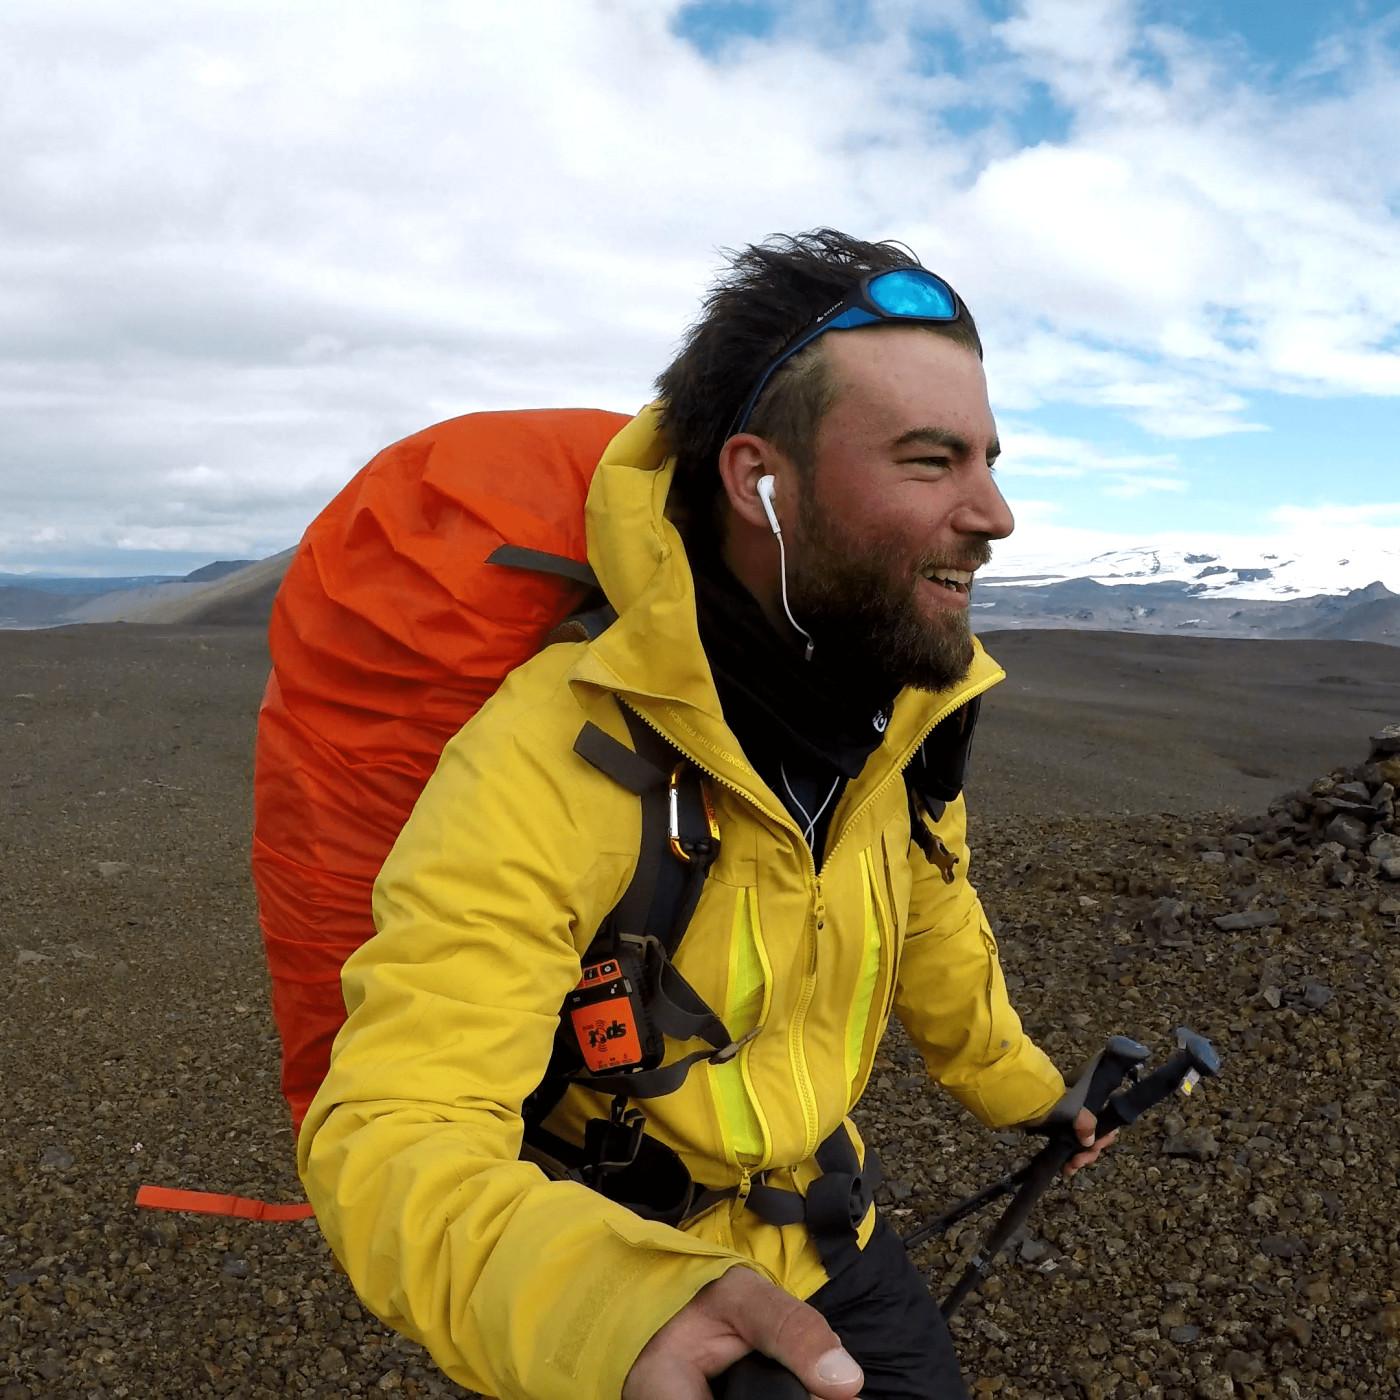 0401 - Globe Trotter - Tortuga : Son premier voyage